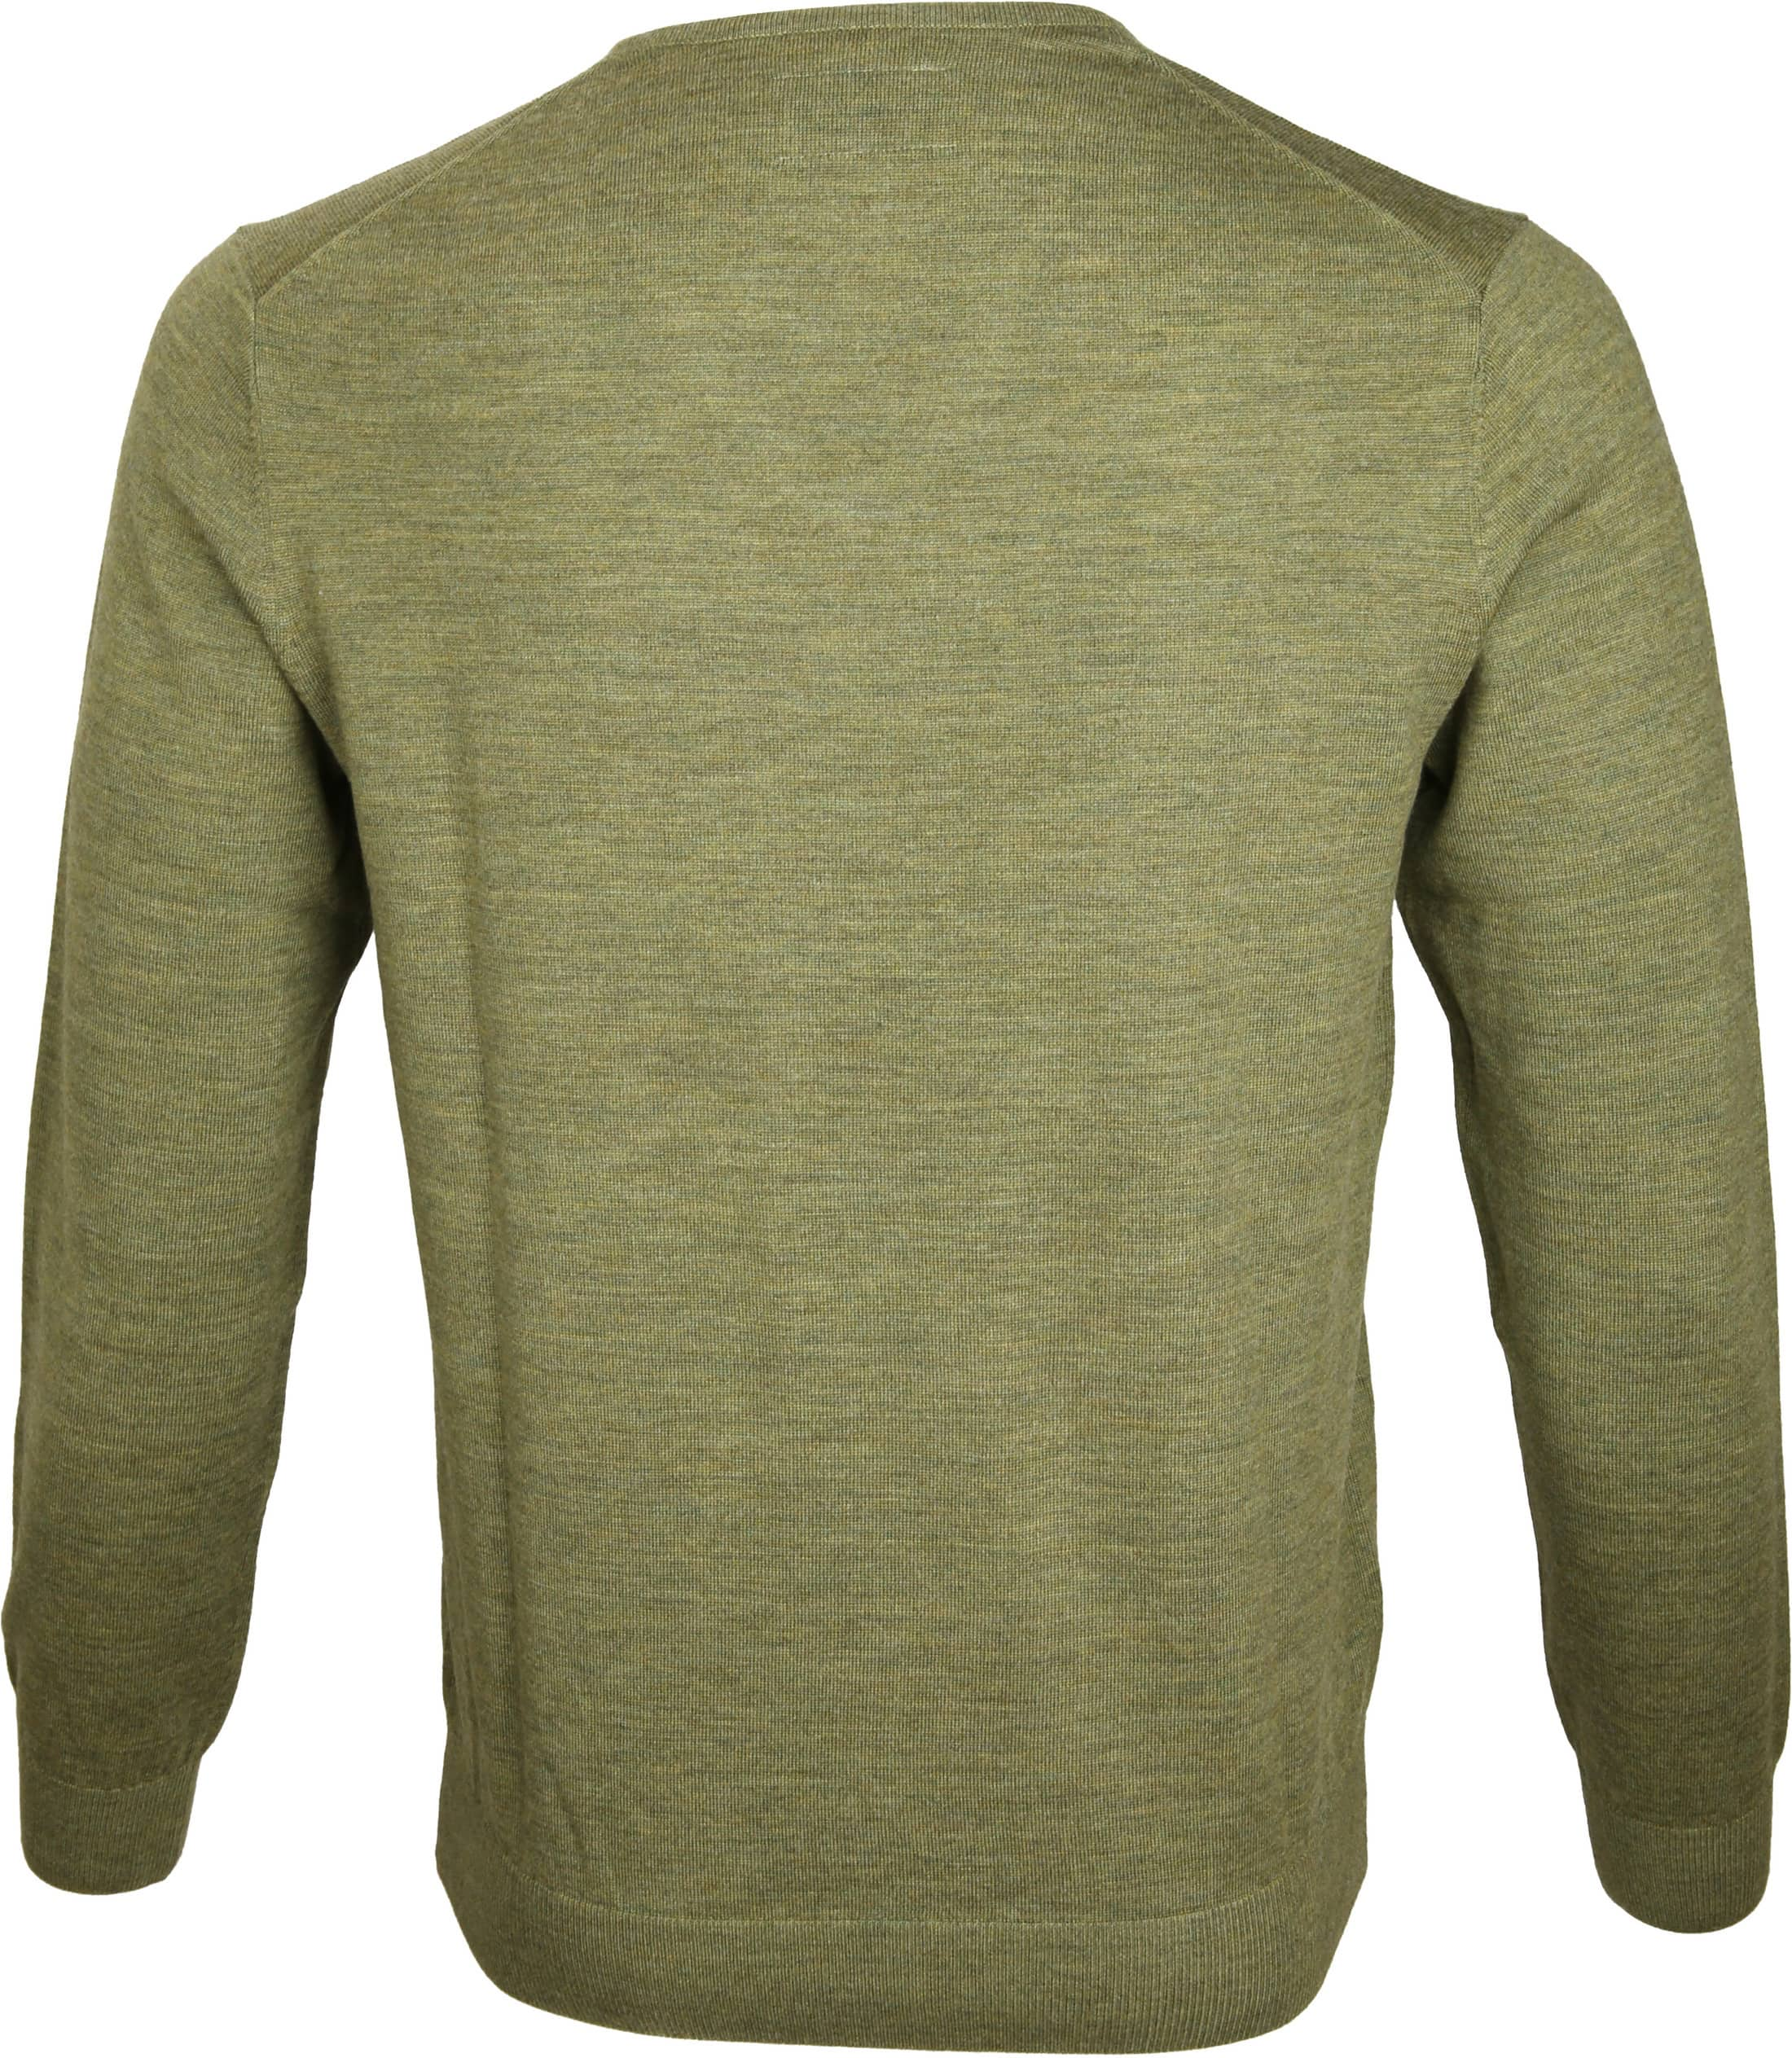 Suitable Prestige Pullover V-Ausschnitt Grün foto 3